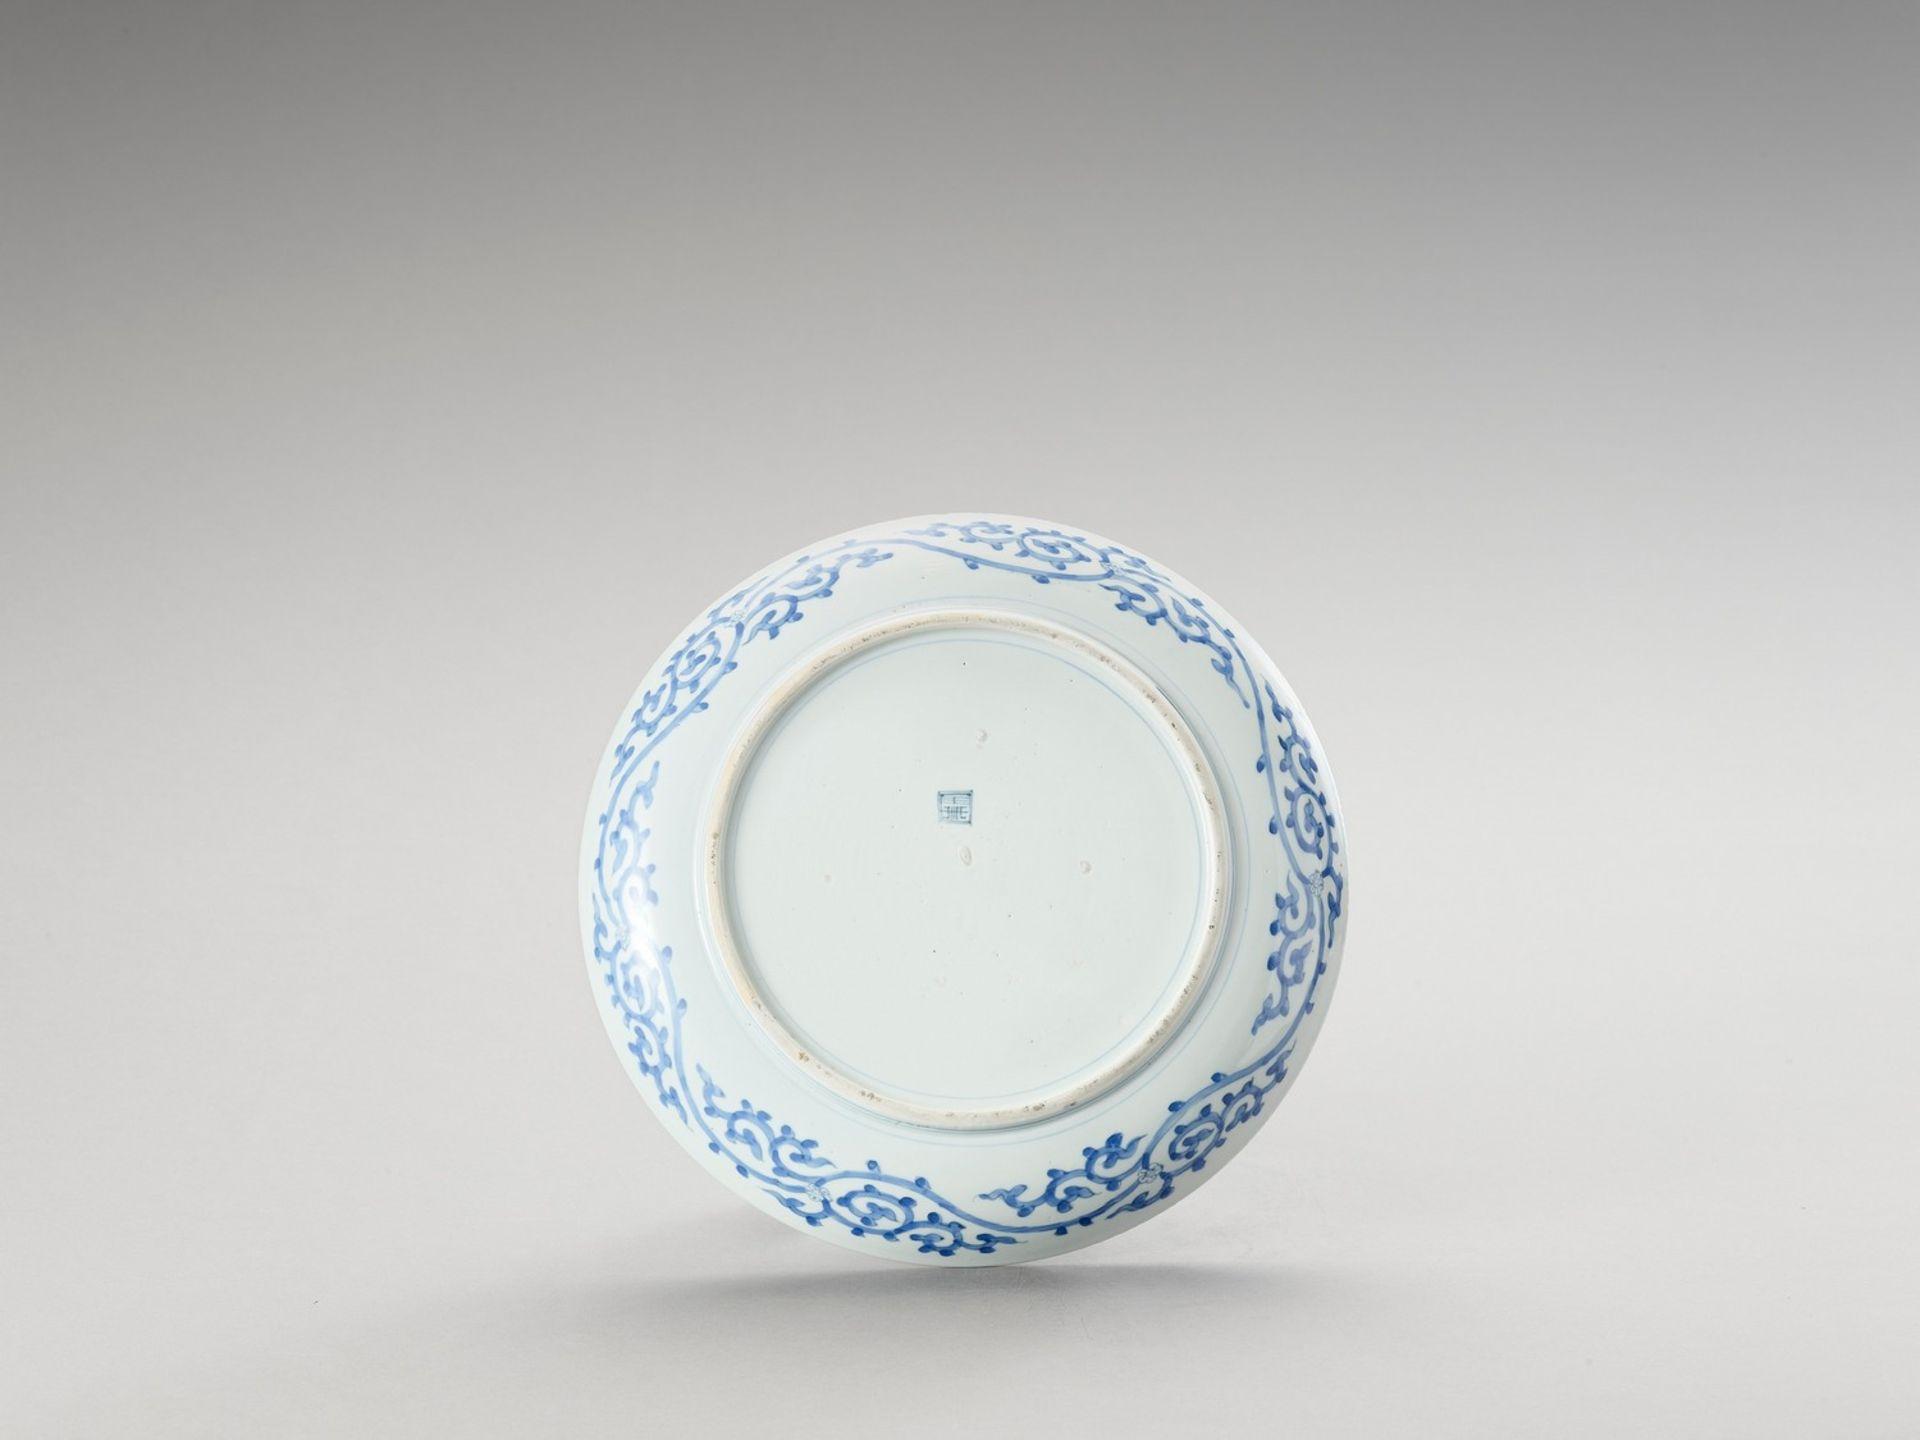 A BLUE AND WHITE PORCELAIN 'DRAGON' PLATE - Bild 3 aus 4